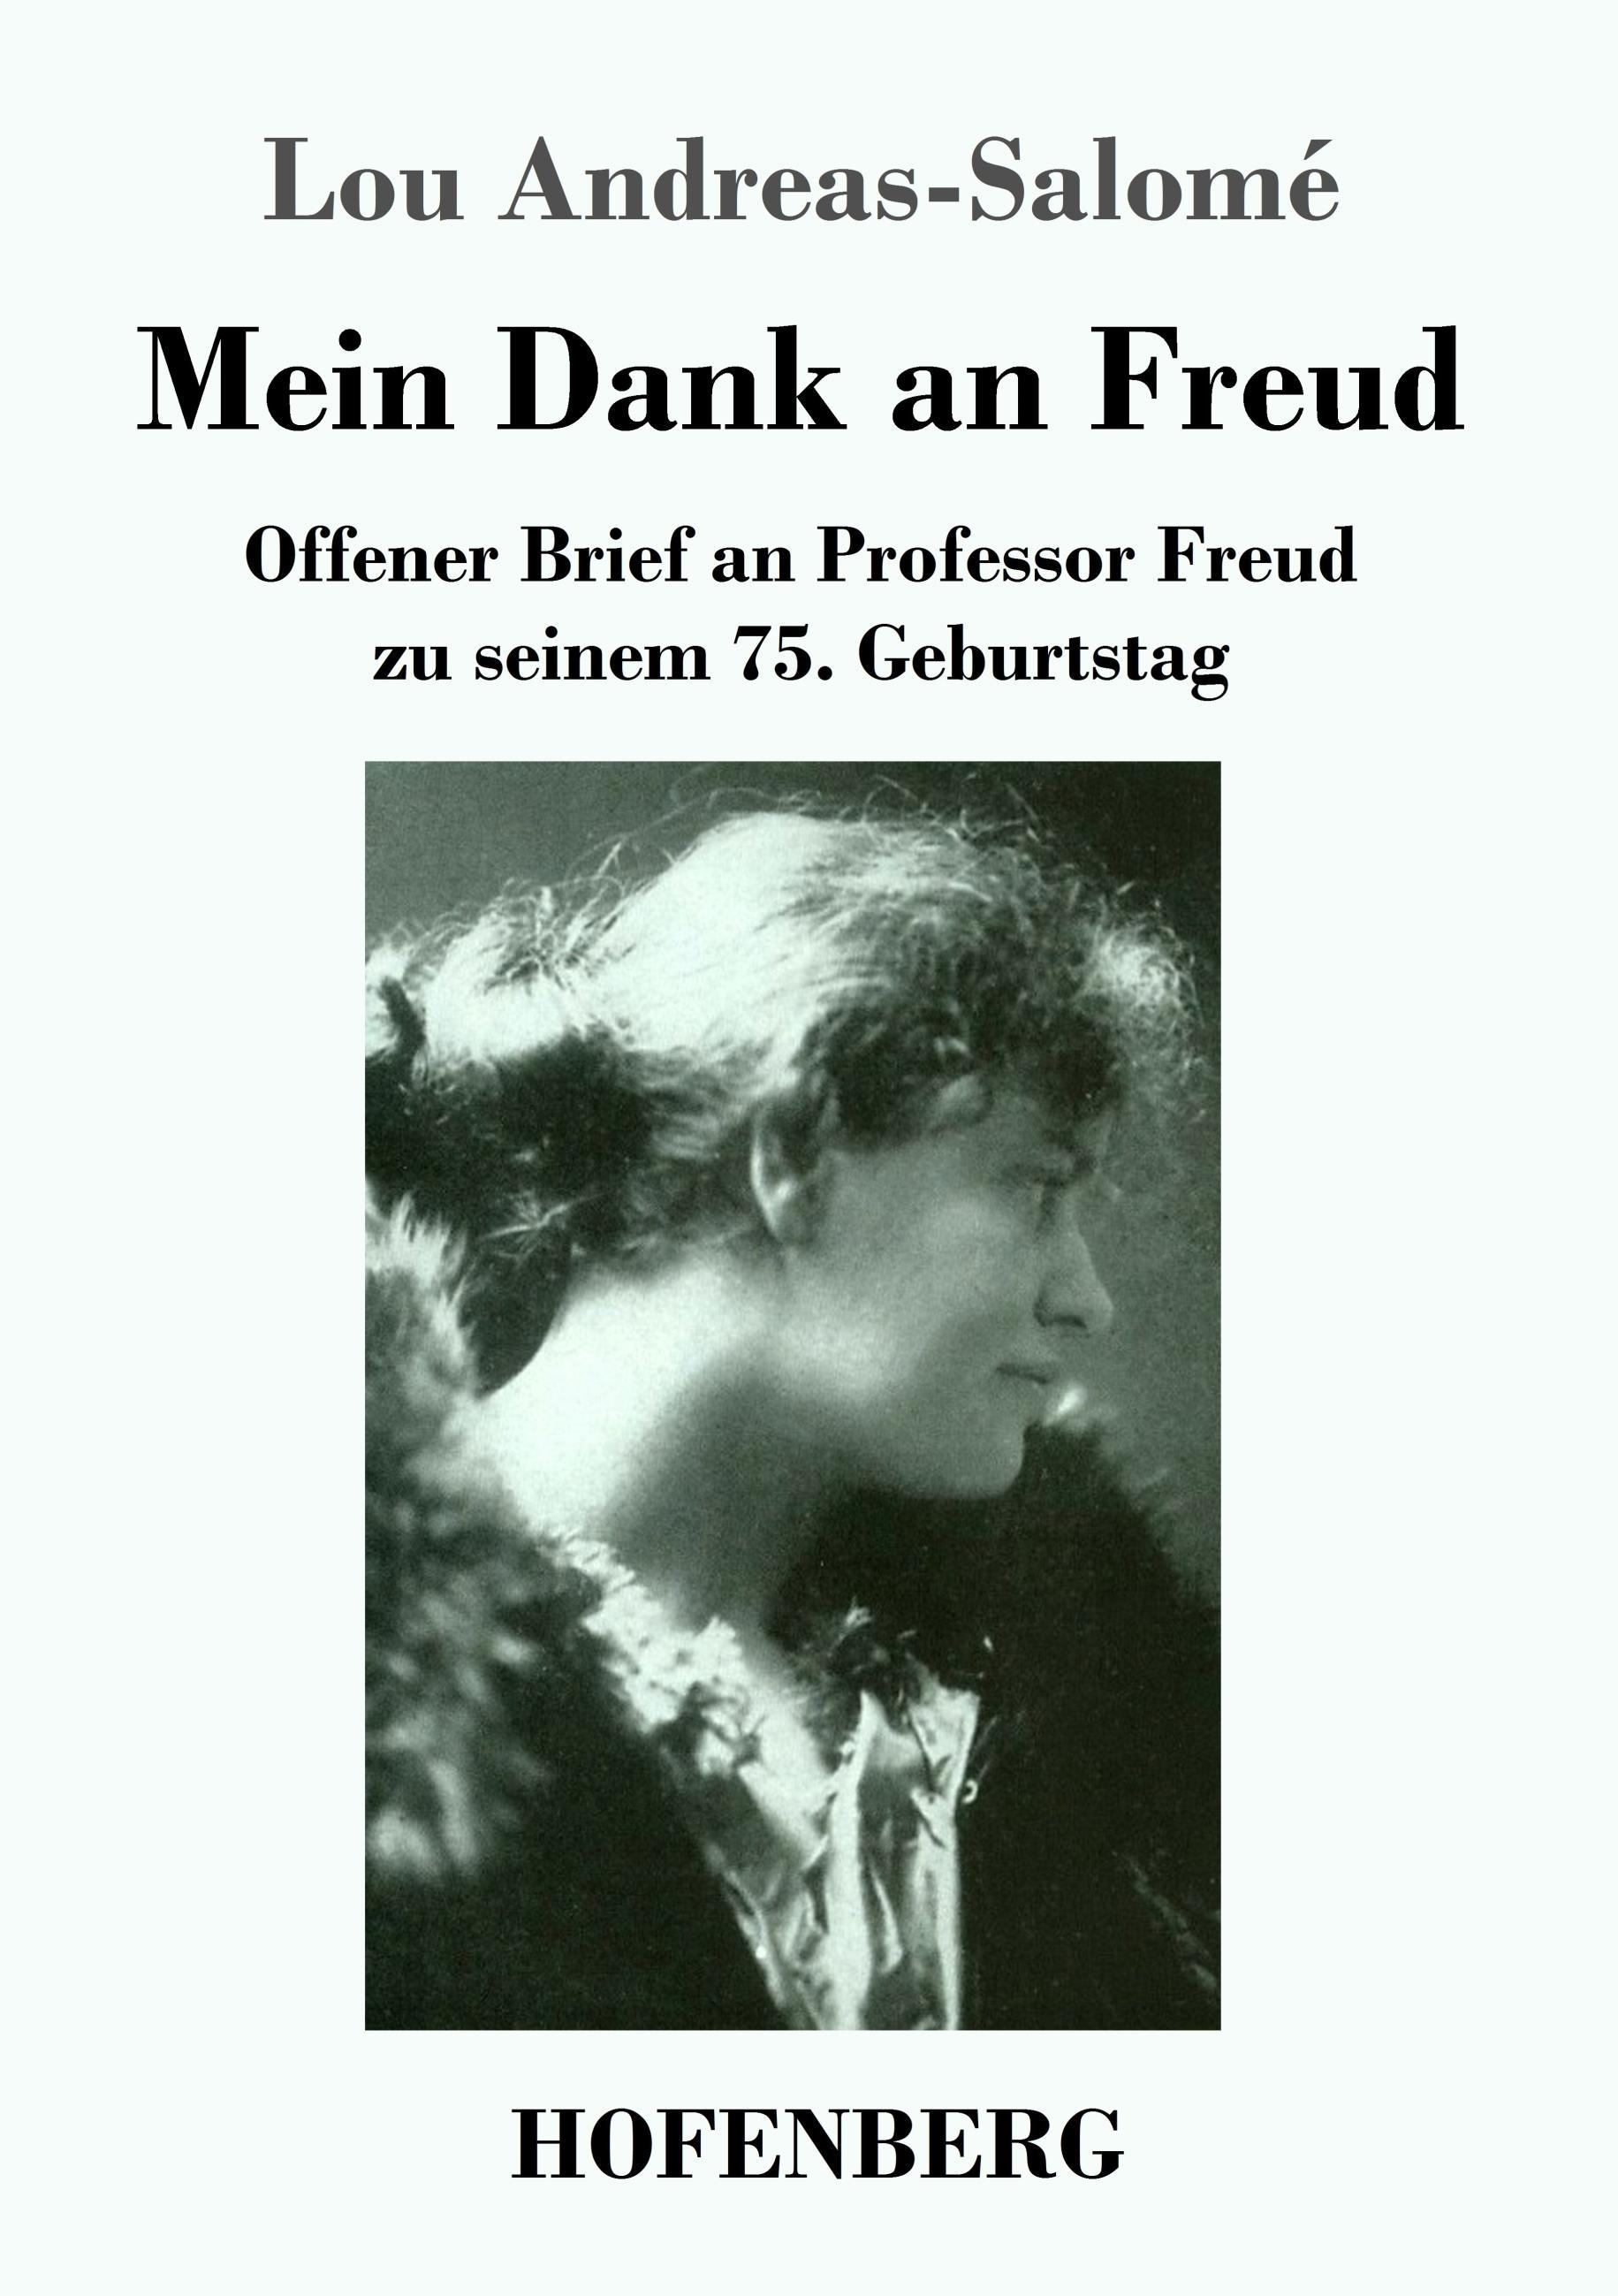 Mein Dank an Freud - Andreas-Salomé, Lou